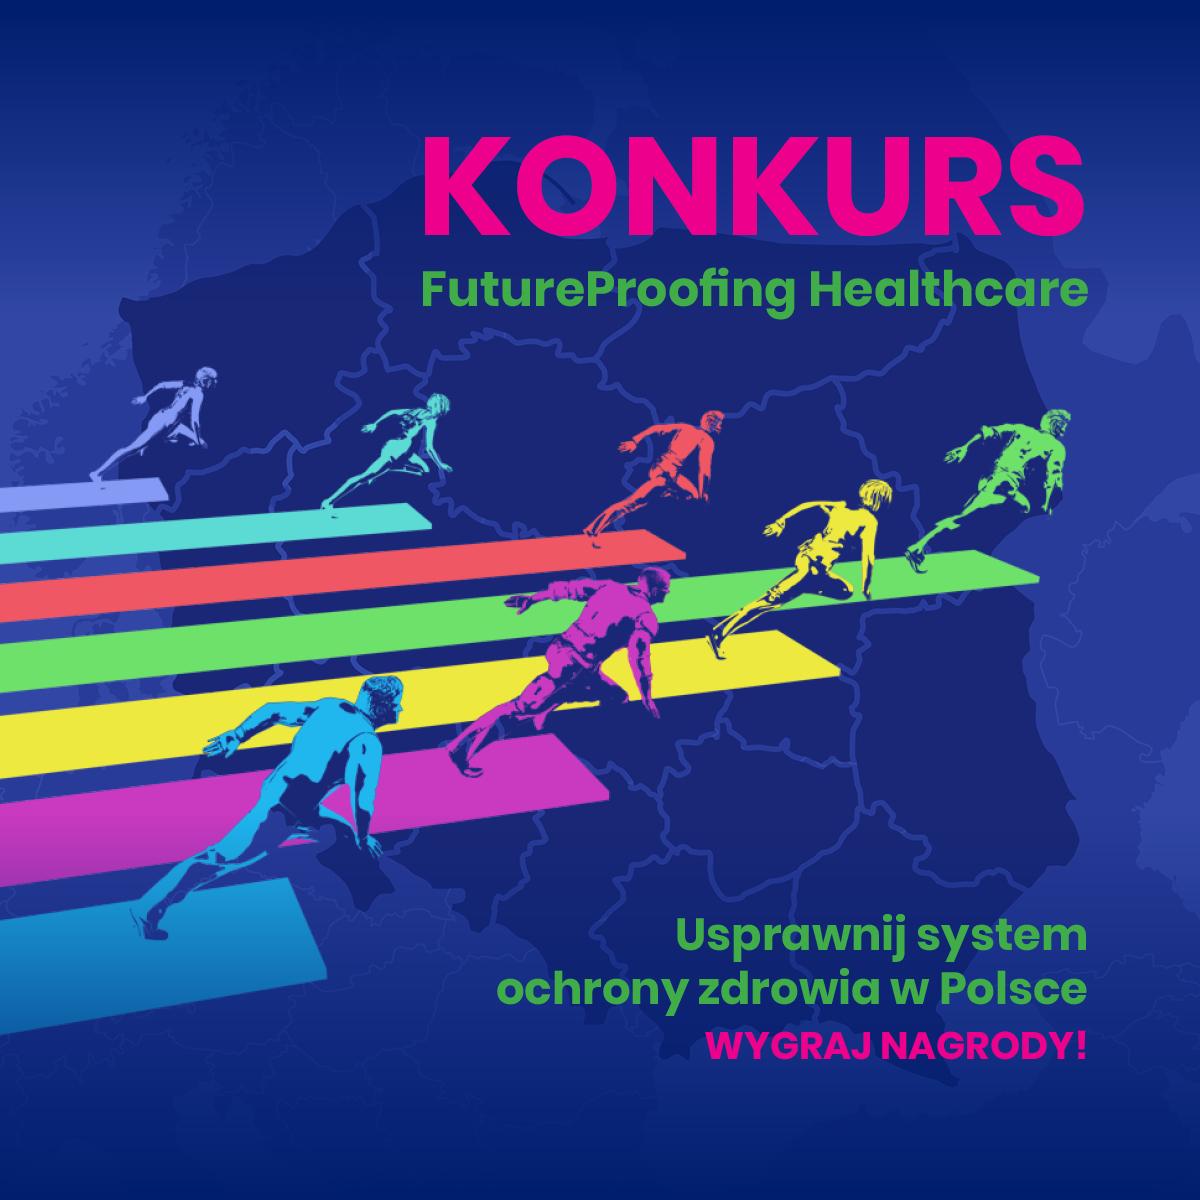 FutureProofing Healthcare